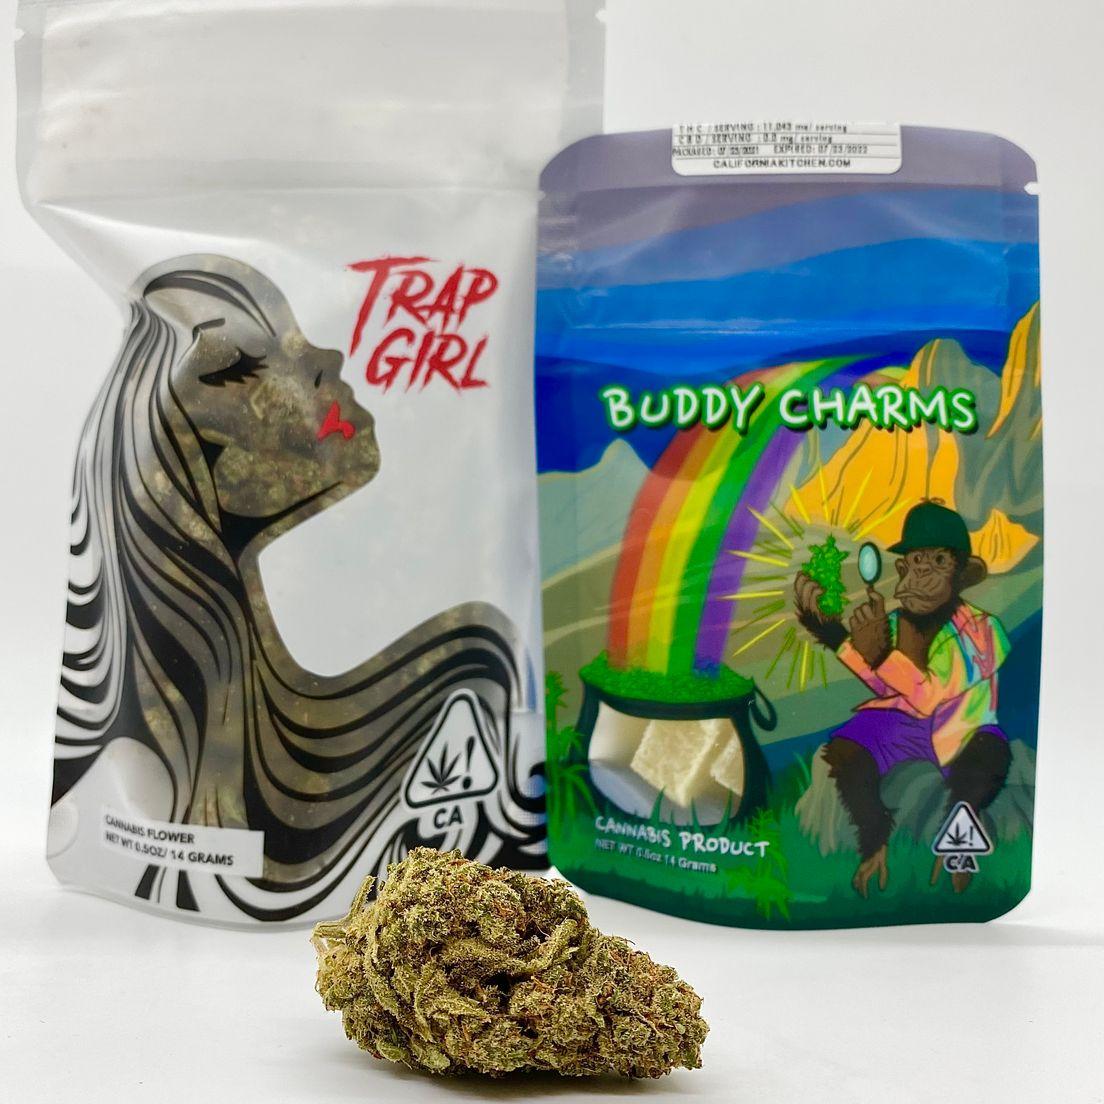 *Deal! $65 1/2 oz. Honey Wine (20.09%/Hybrid) - Trap Girl + 50mg Gummy Cubes - Buddy Charms